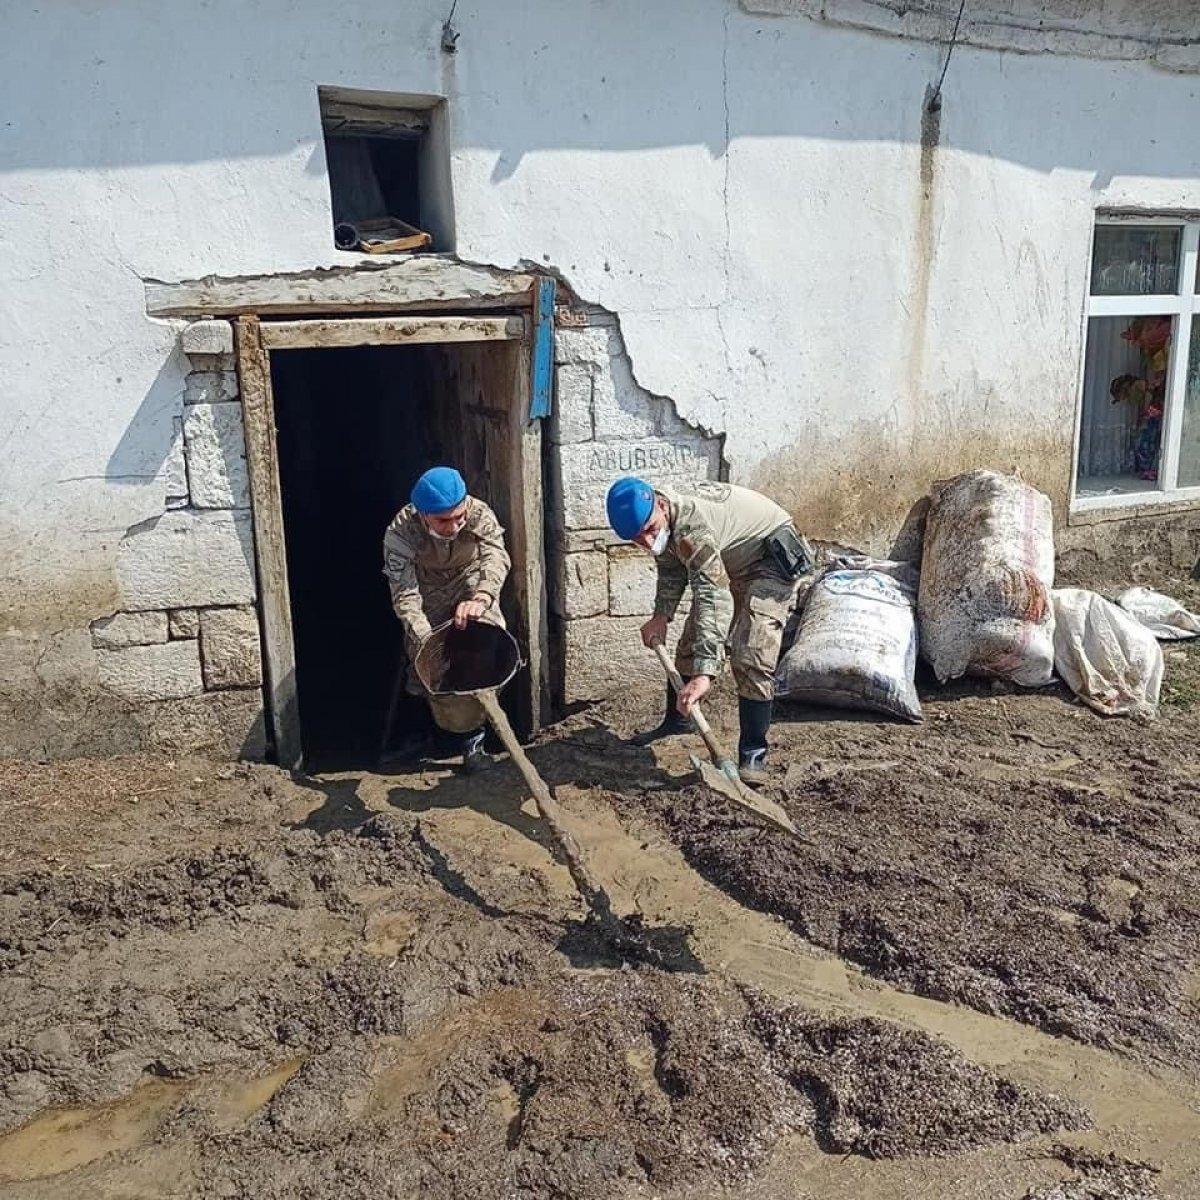 Kars'ta, jandarma ve komandolar sel bölgesinde  #3